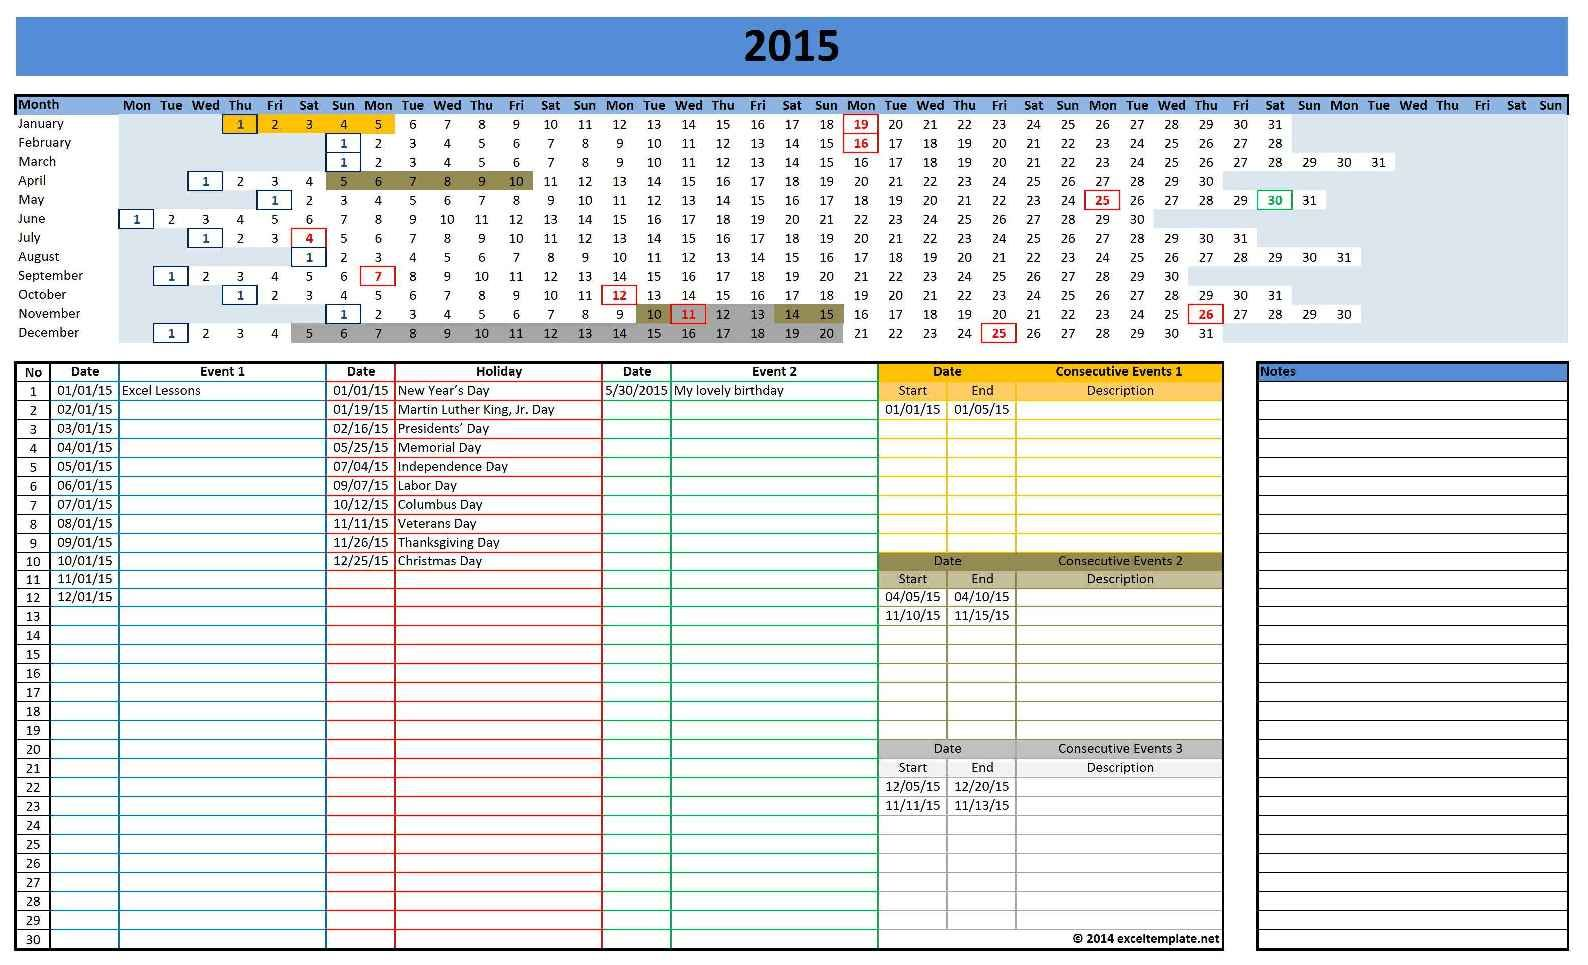 Open Office Spreadsheet Templates In 2020 Excel Calendar Template Excel Calendar Excel Templates